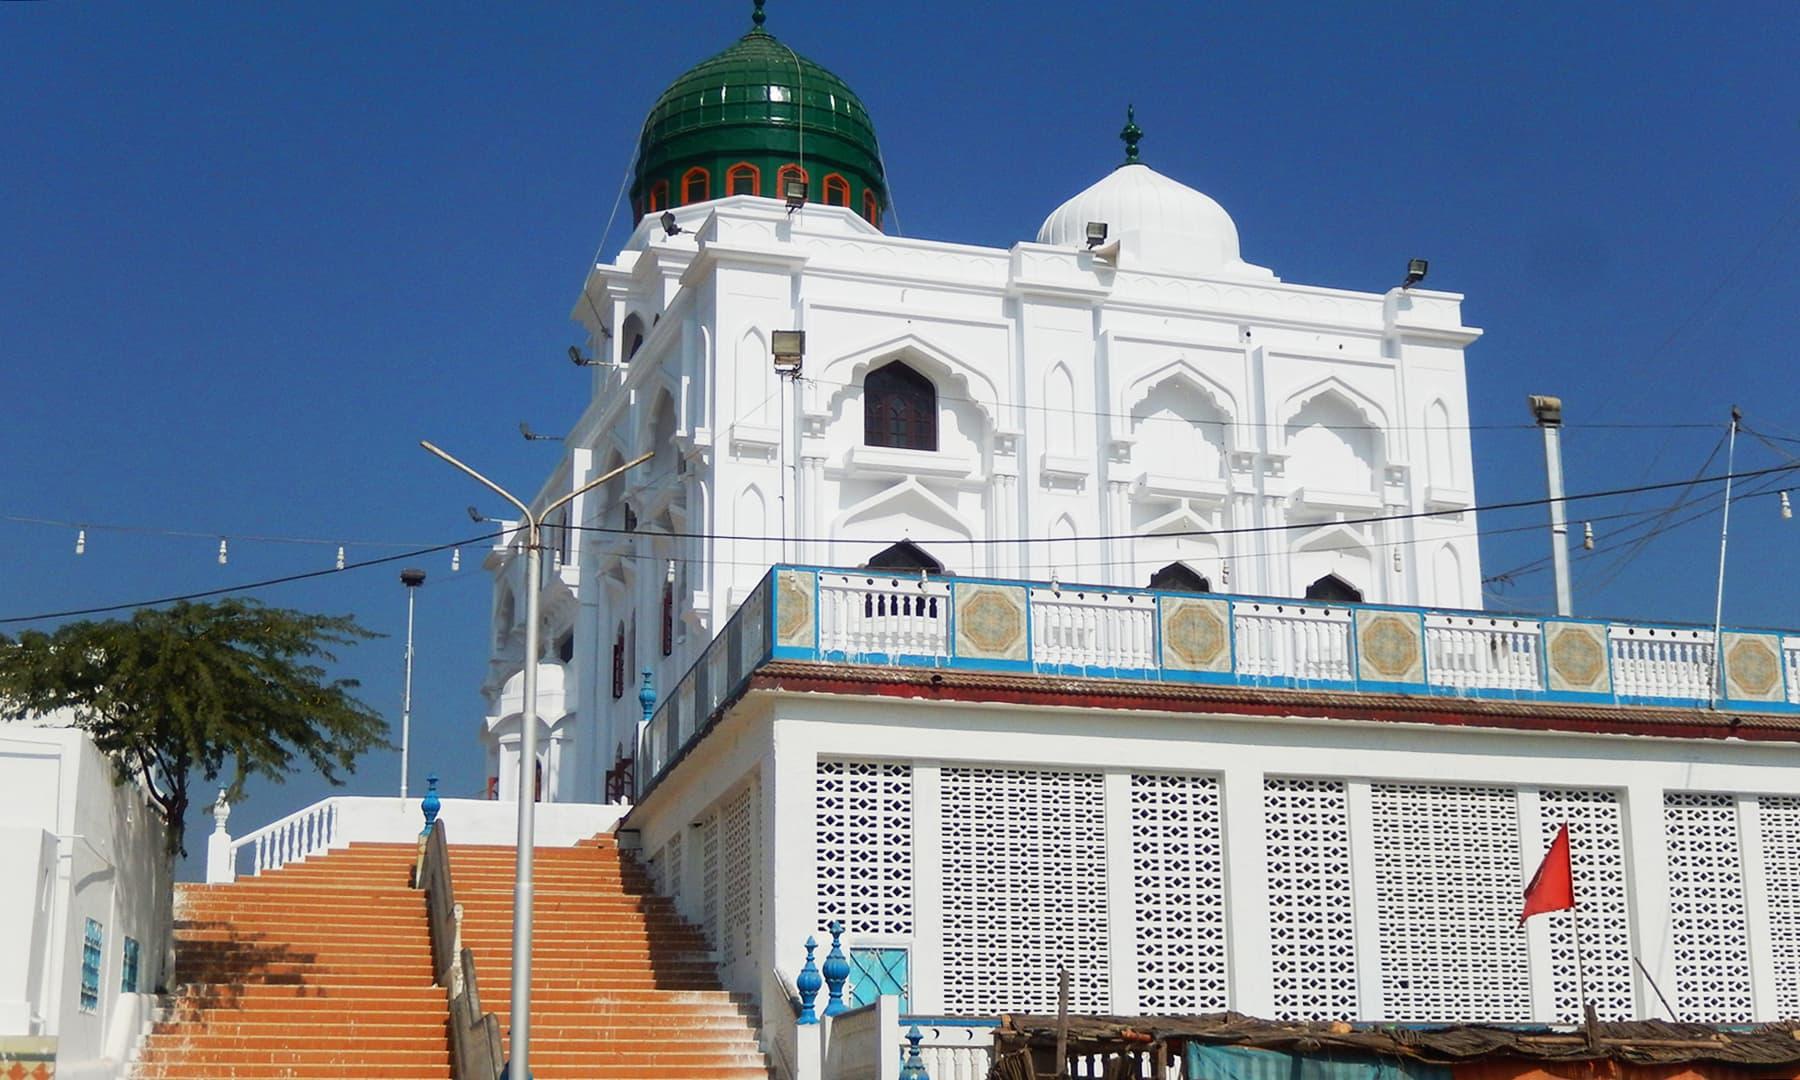 درگاہ شاہ جمیل شاہ ڈاتار — تصویر ابوبکر شیخ